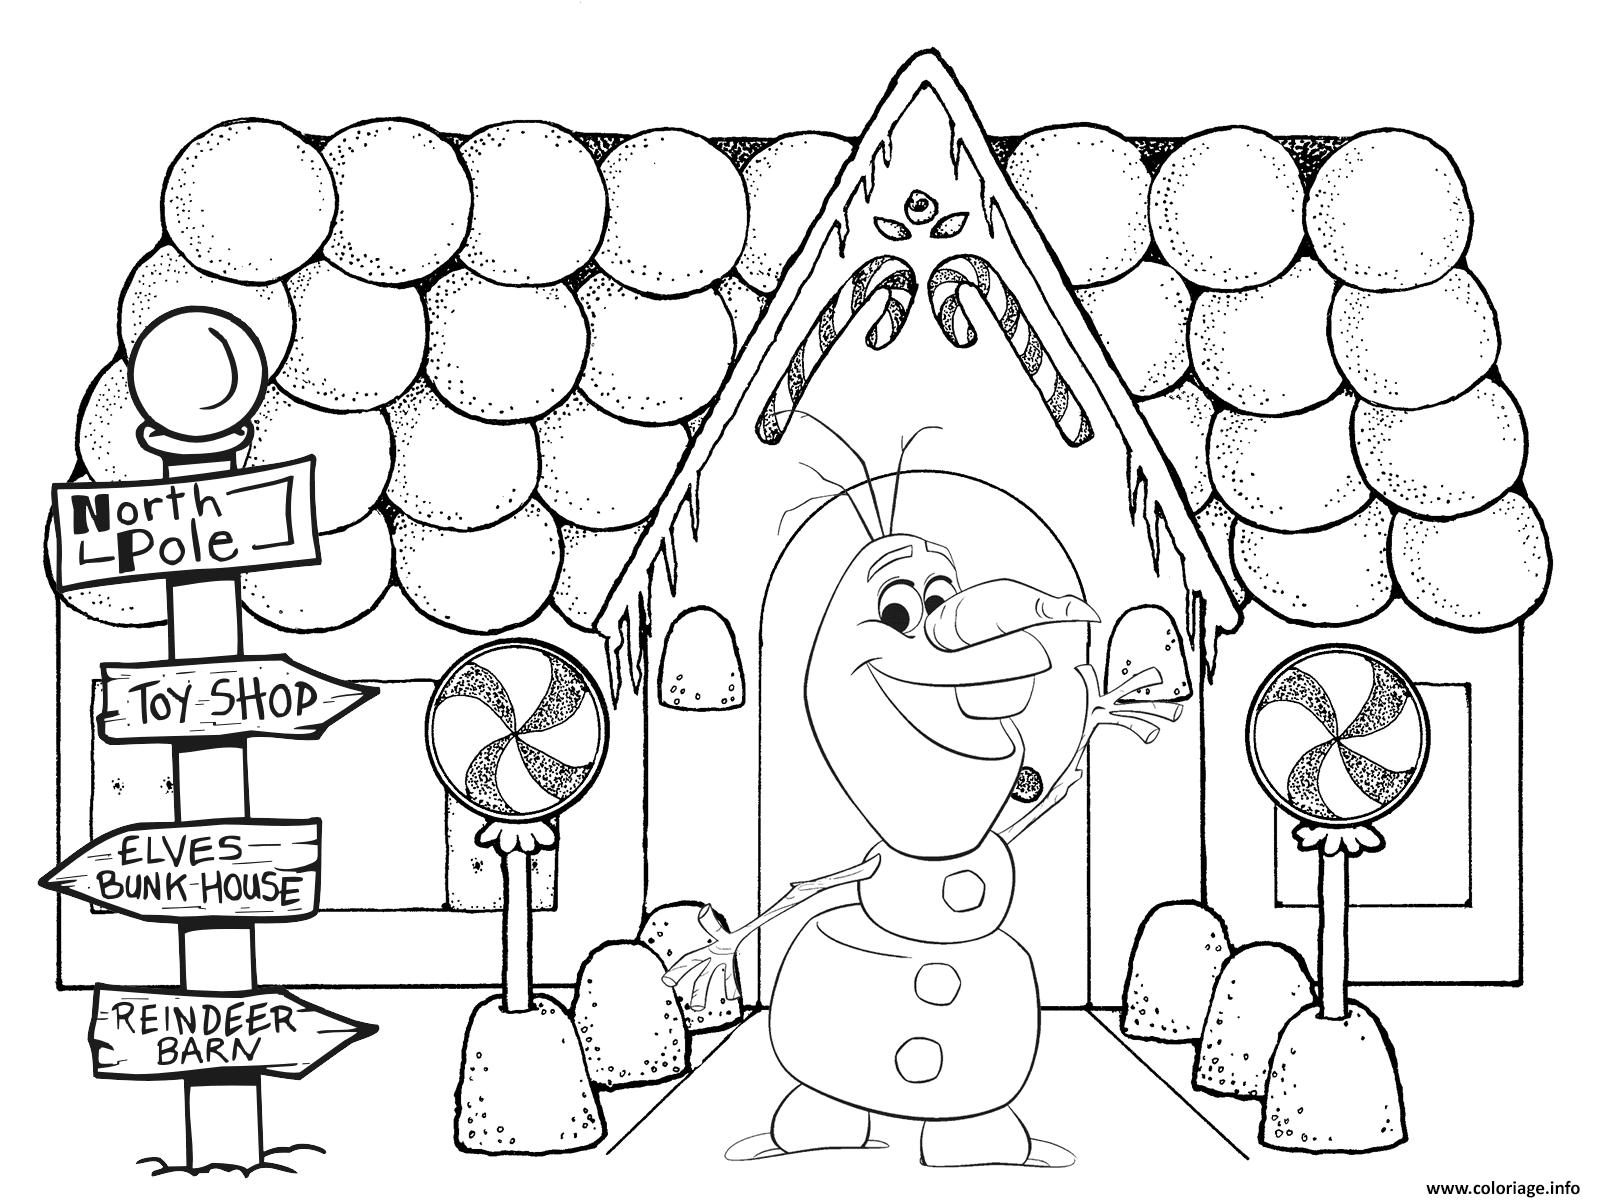 Coloriage Olaf à Imprimer